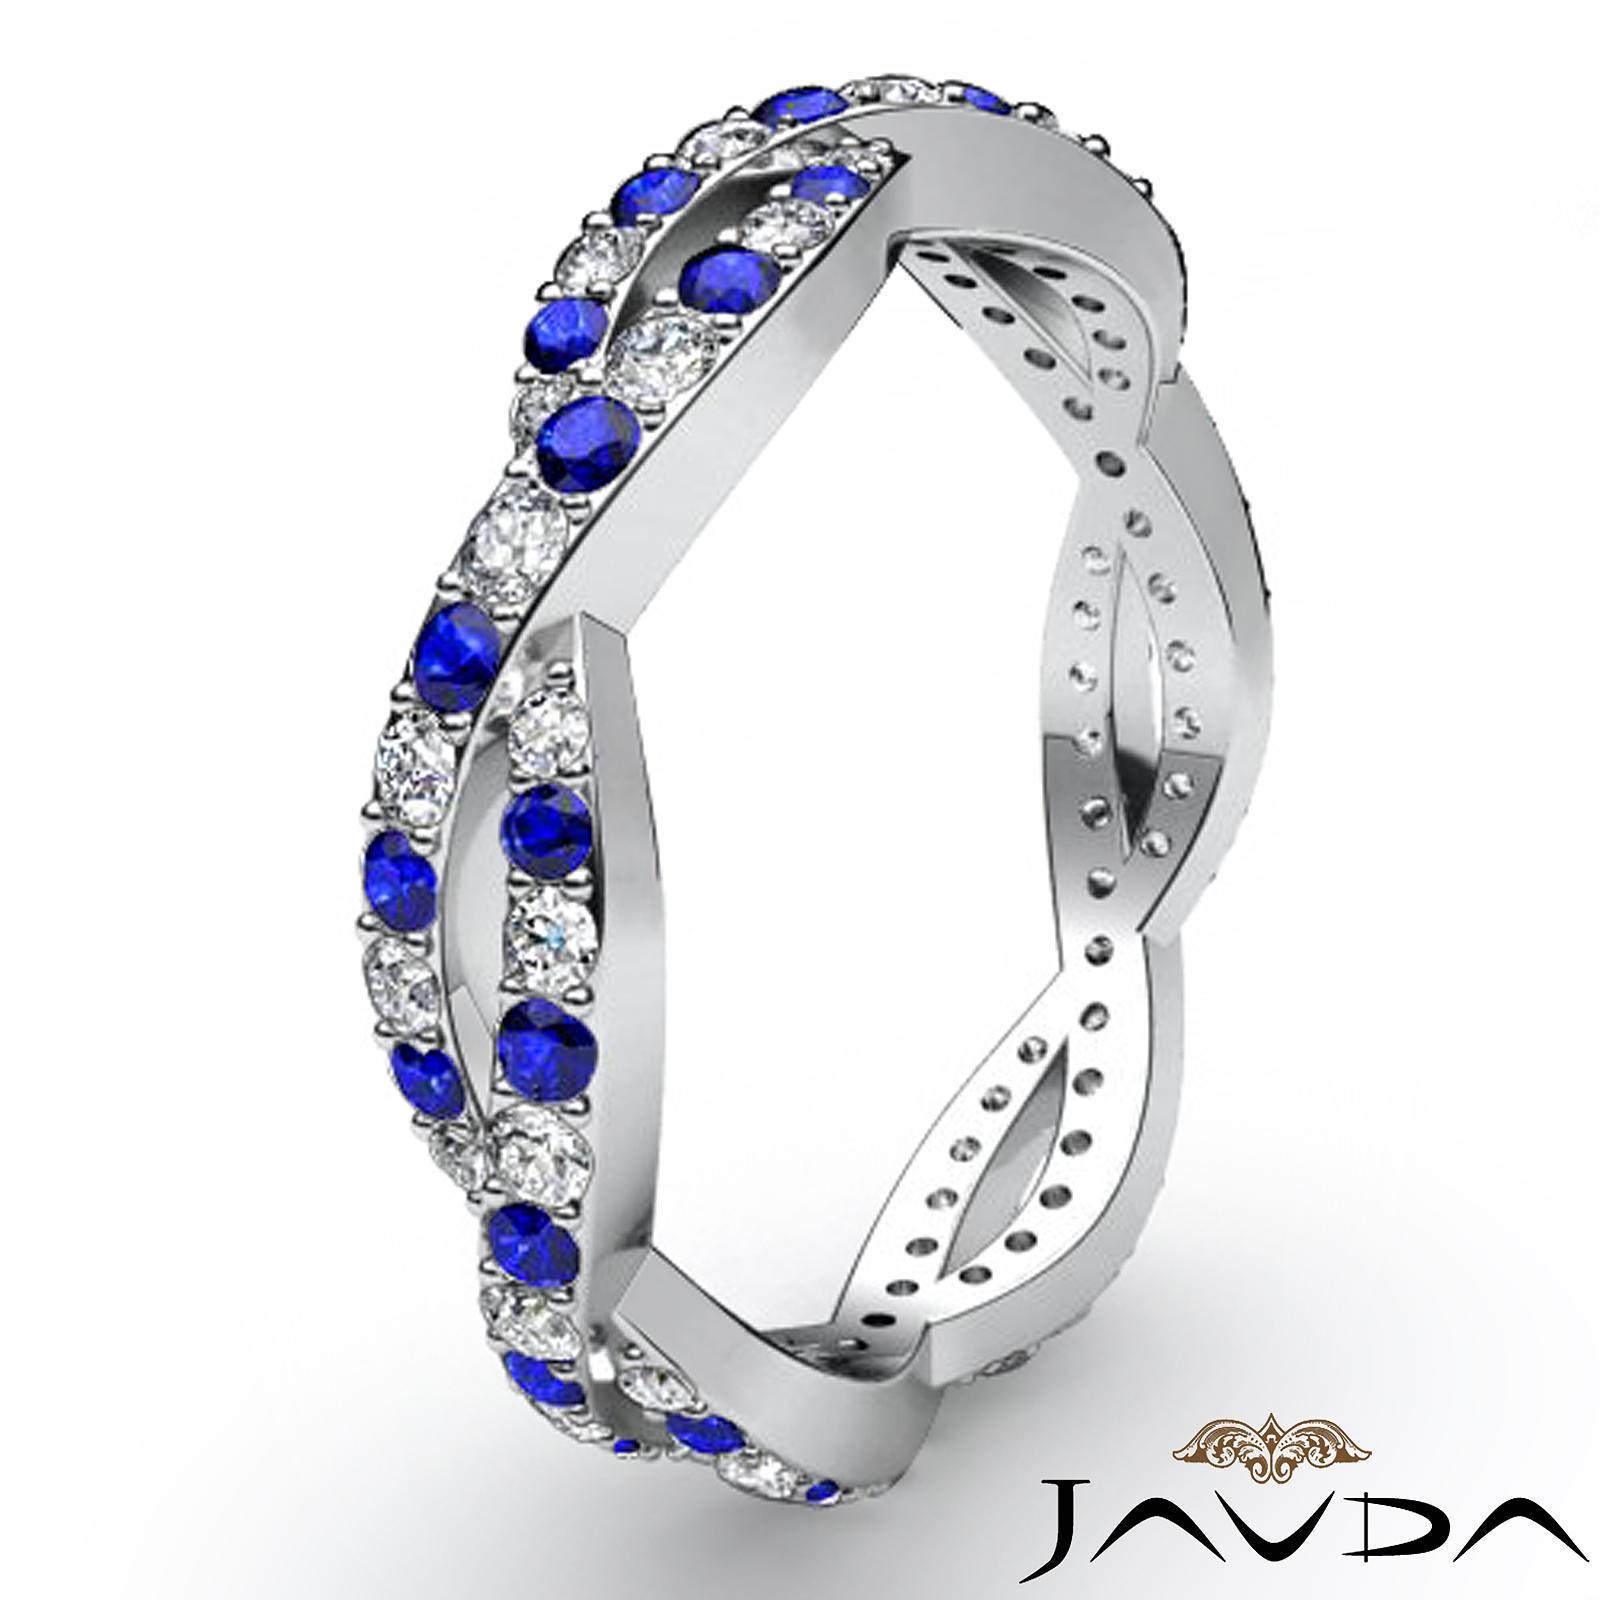 Round Sapphire Pave Diamond Eternity Wedding Band Women s Ring